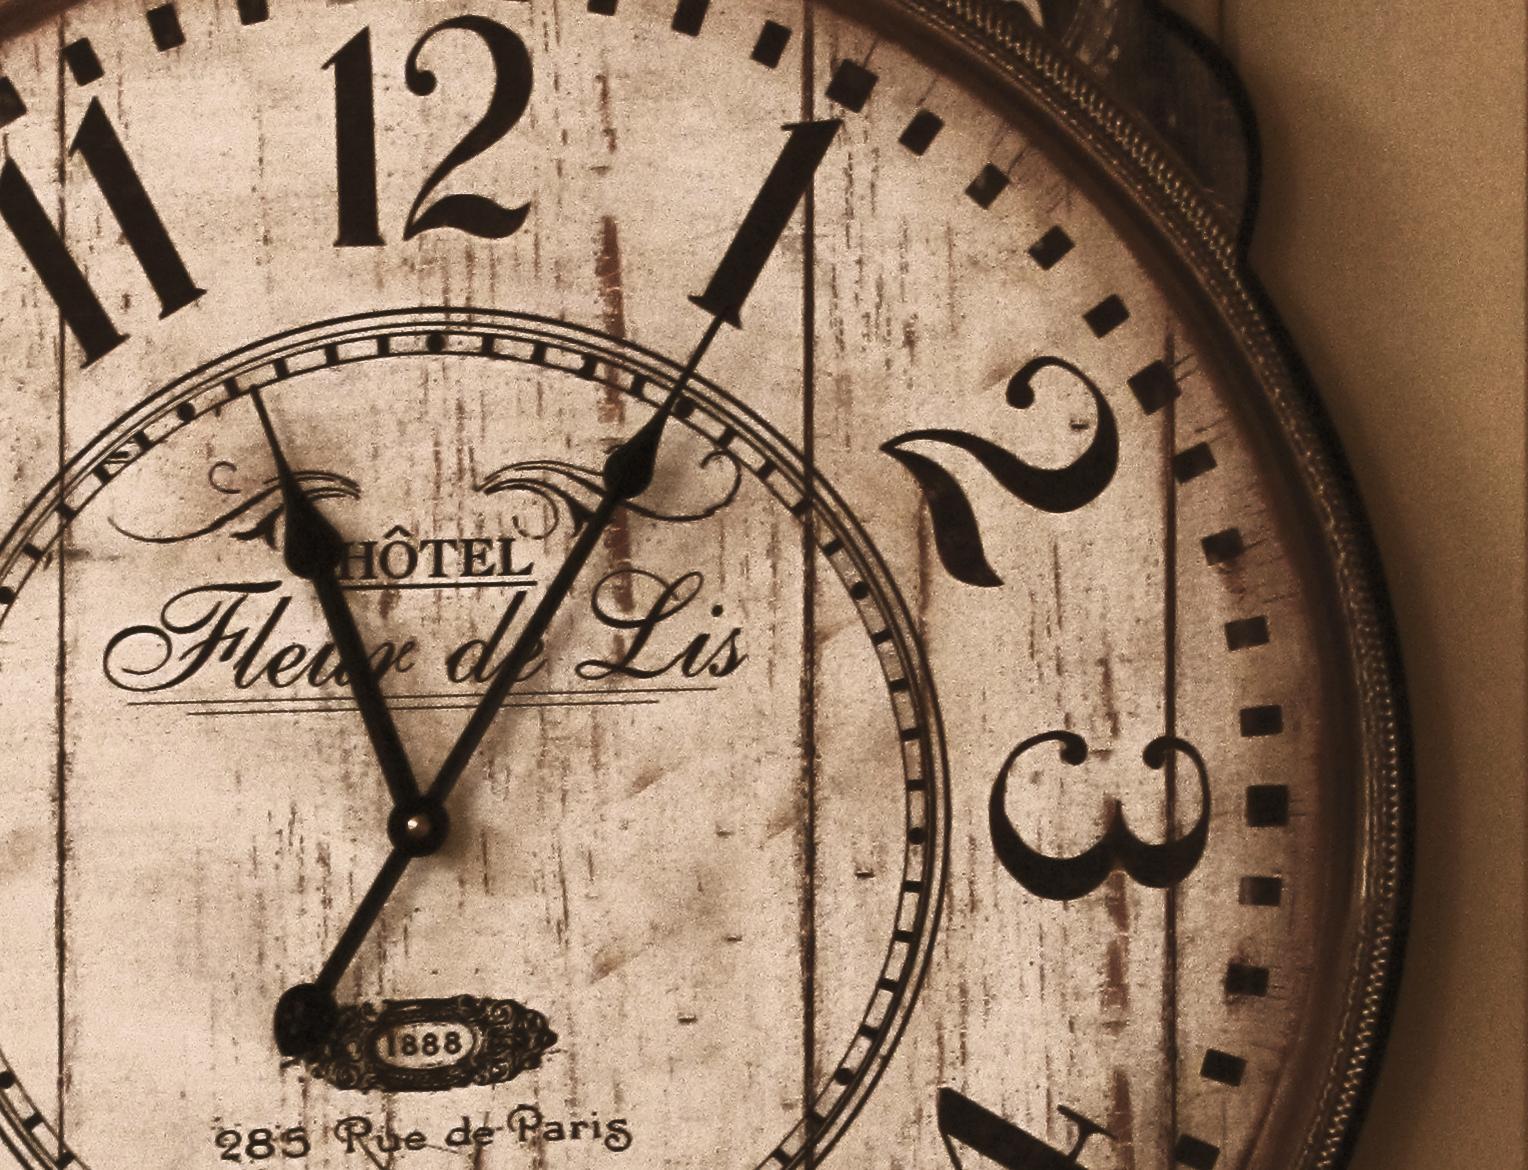 Clock-fleur-de-lis.jpg